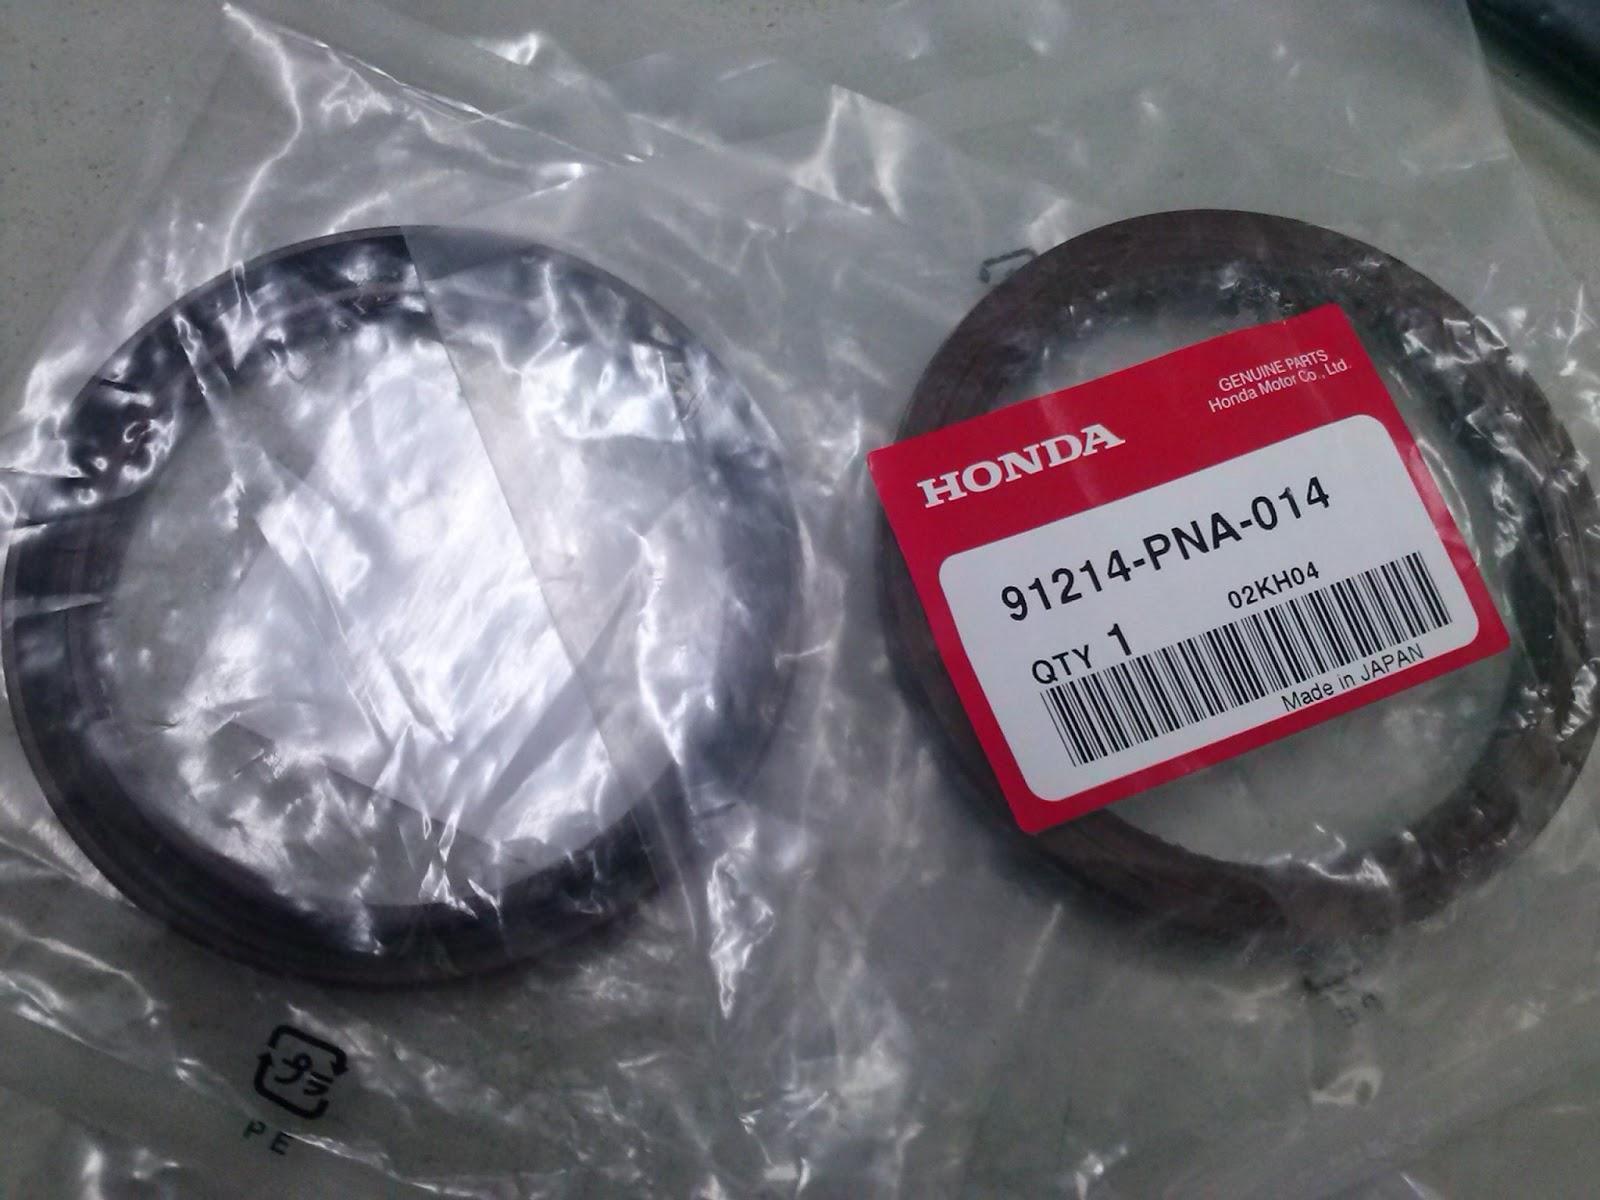 Honda Parts Japanese Car Specialist